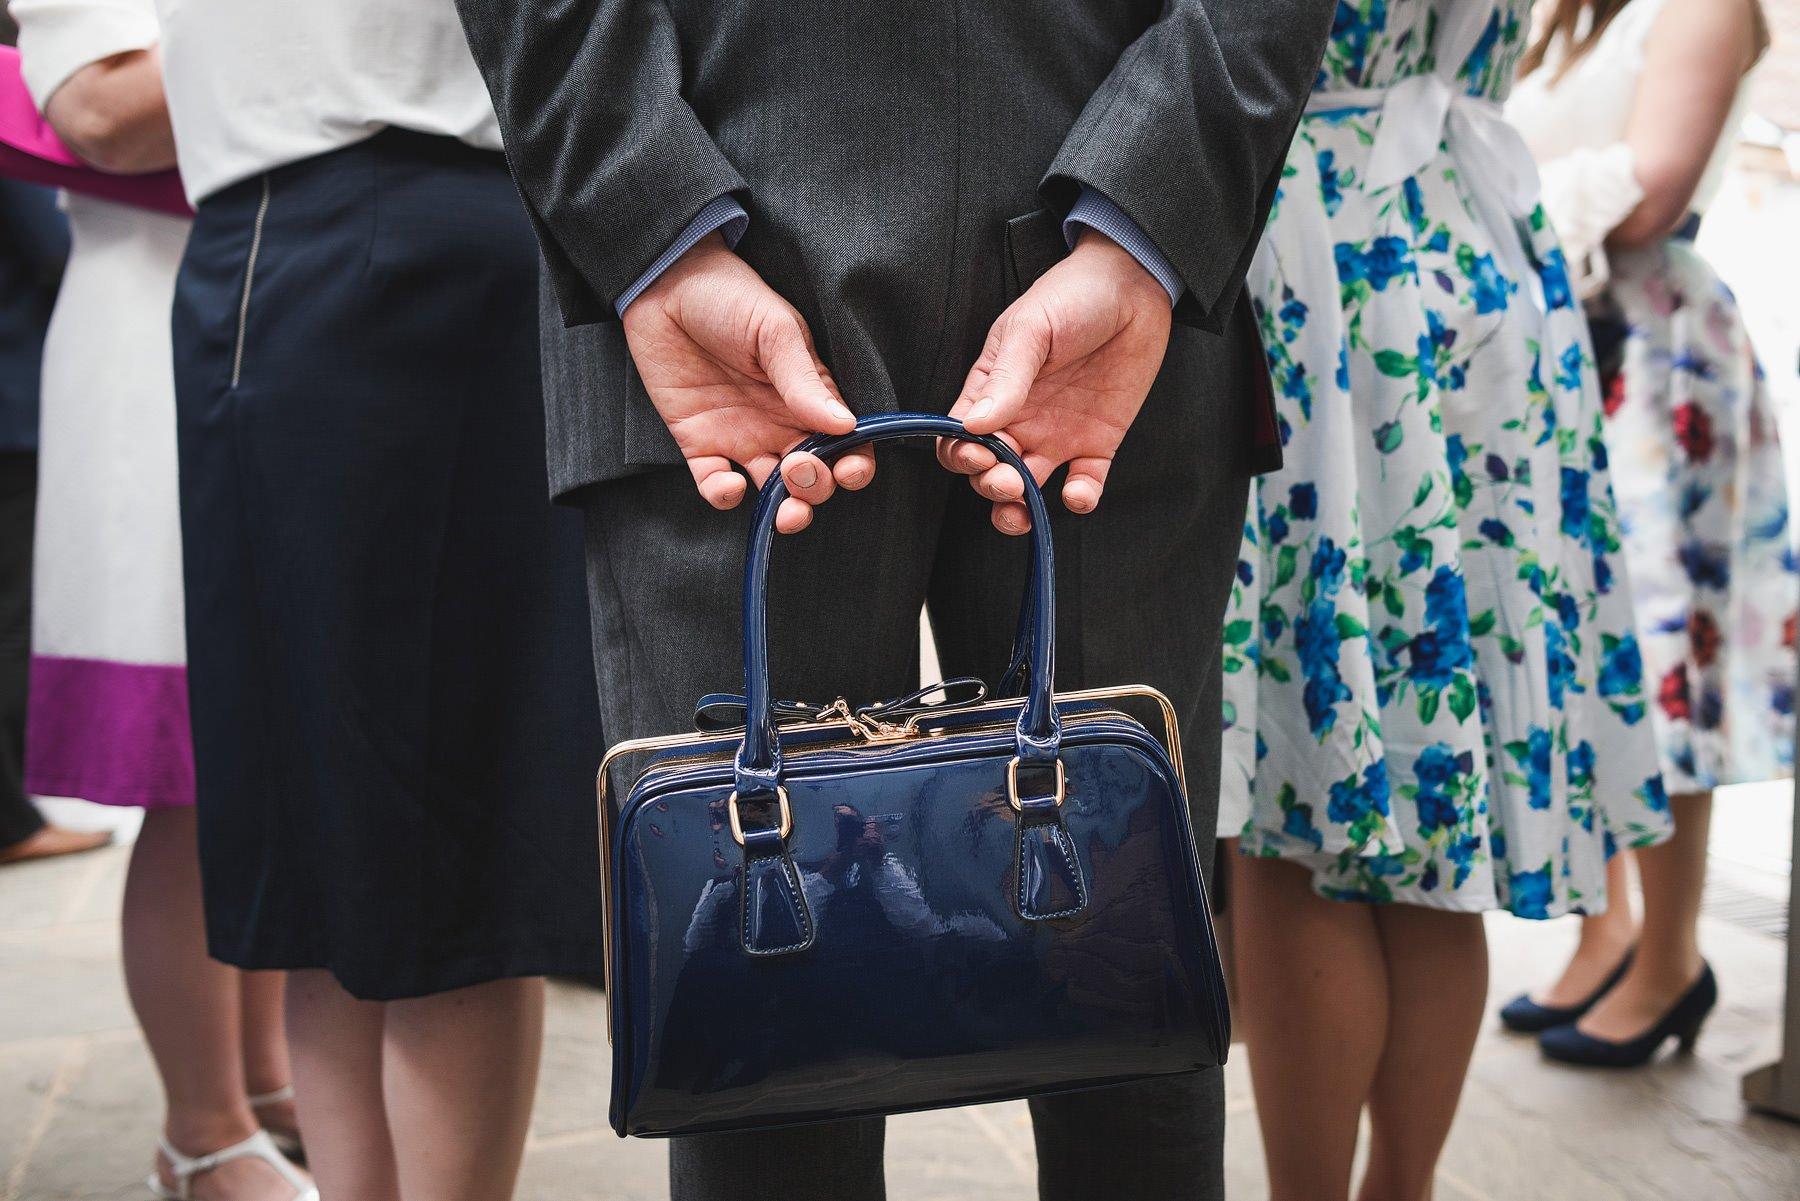 man holding handbag at a wedding